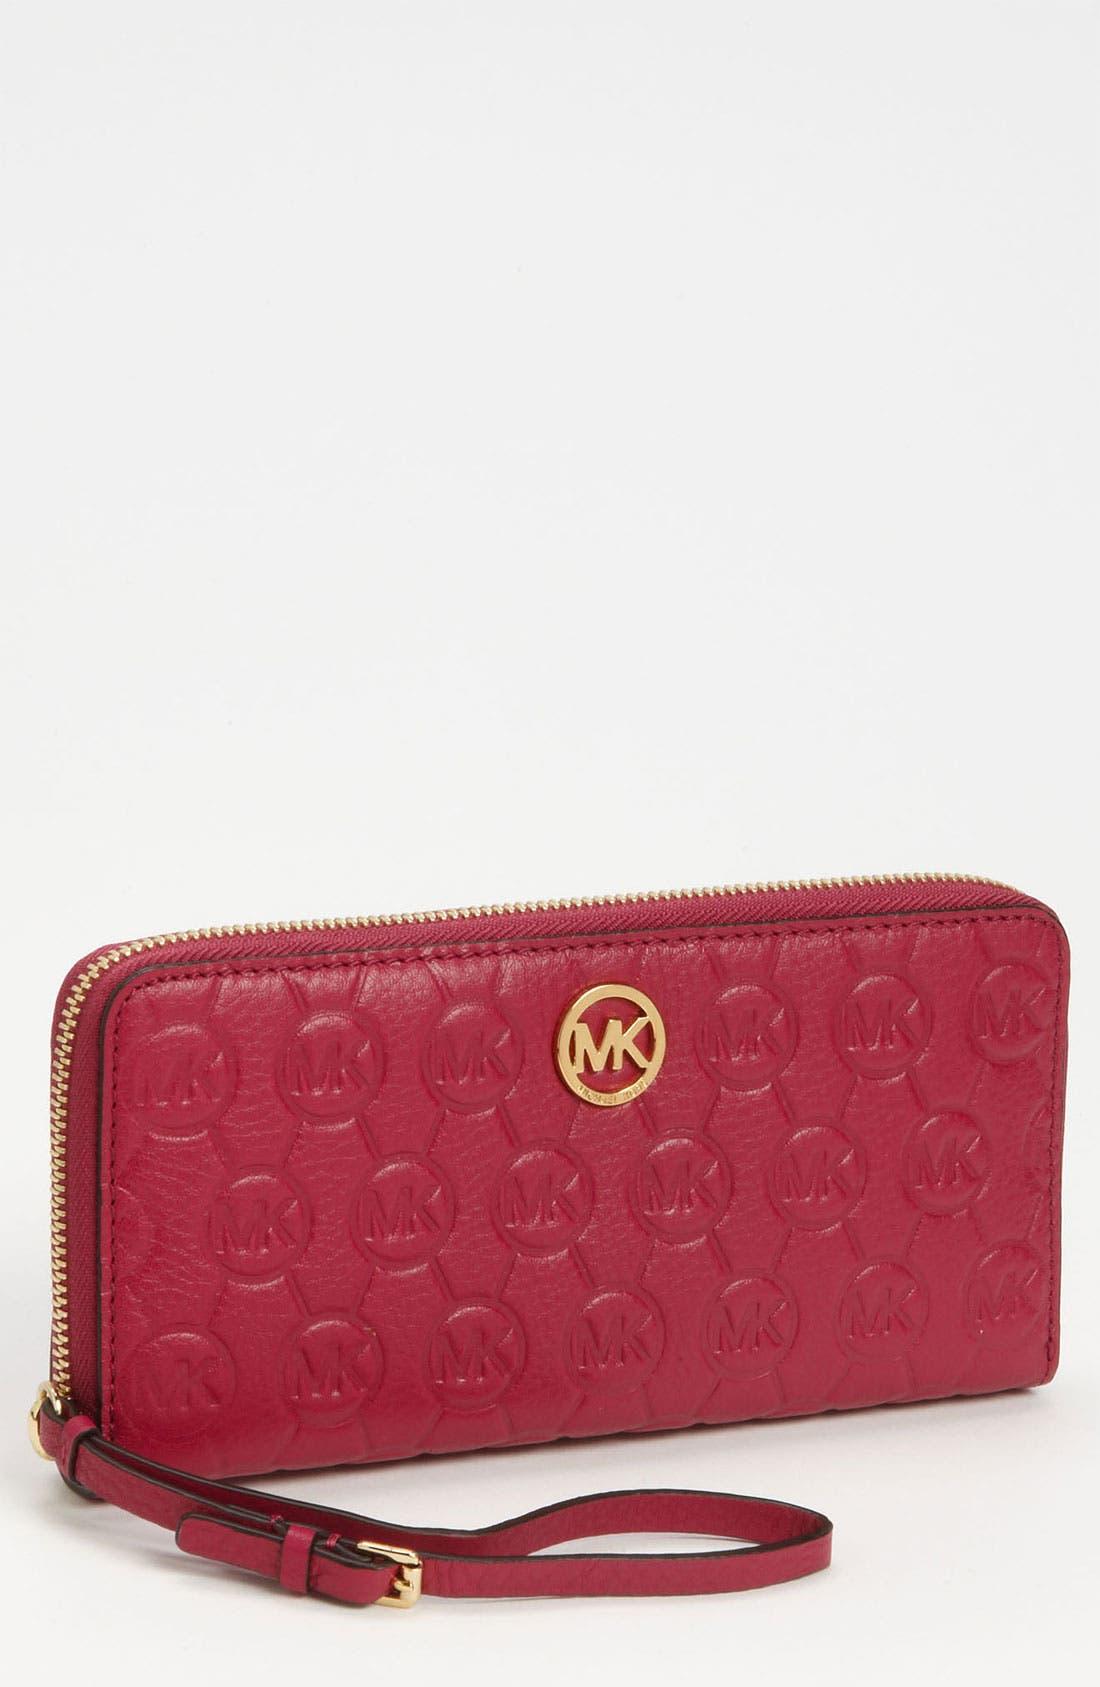 Main Image - MICHAEL Michael Kors Monogram Embossed Leather Wallet